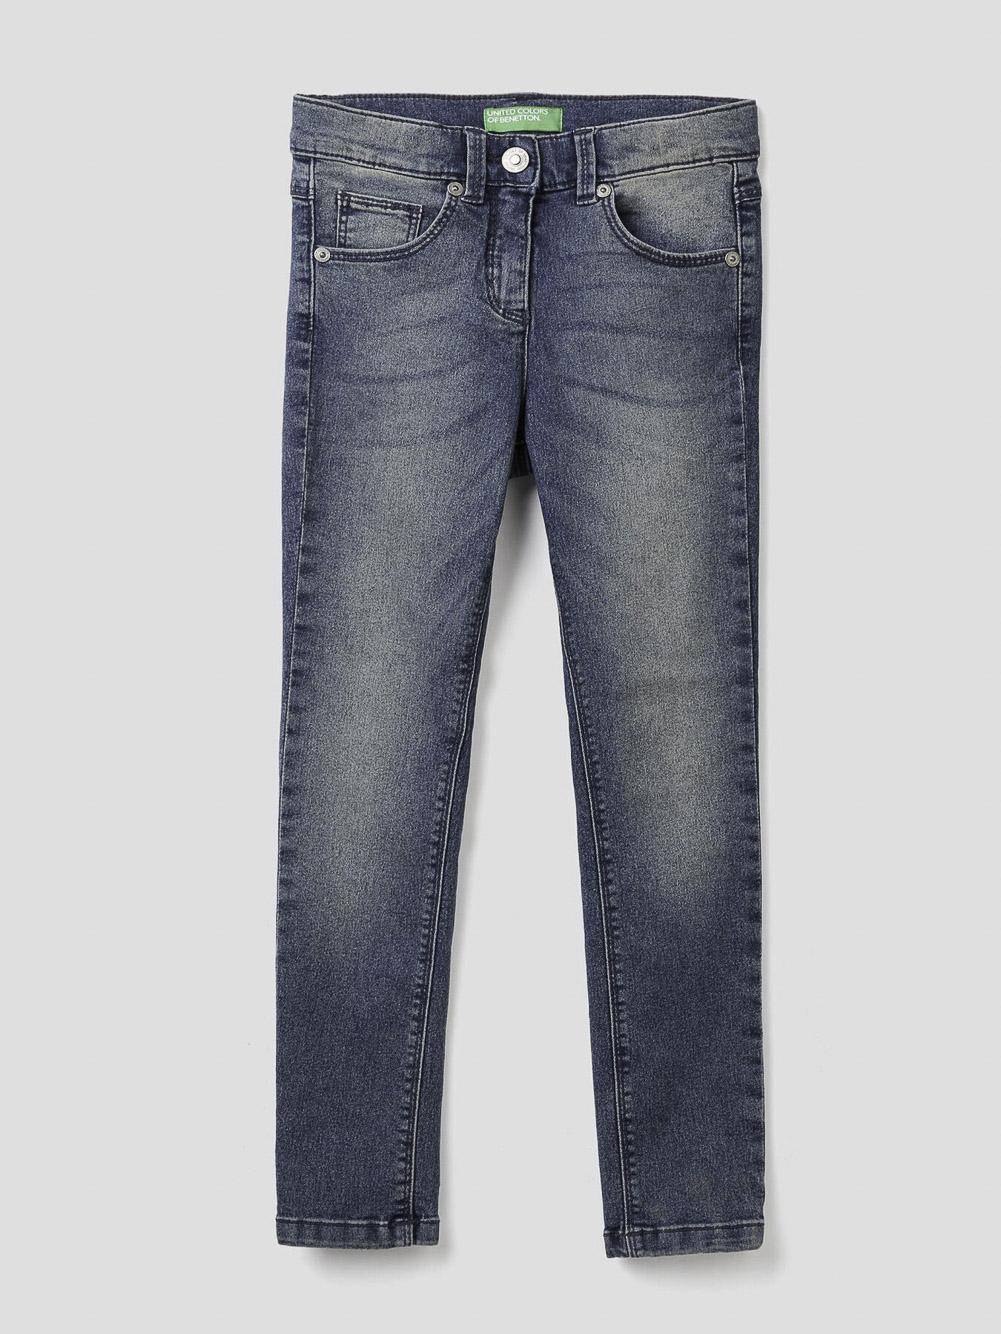 012 BENETTON Τζιν με πέντε τσέπες skinny fit 4DUR57LV0 20A911